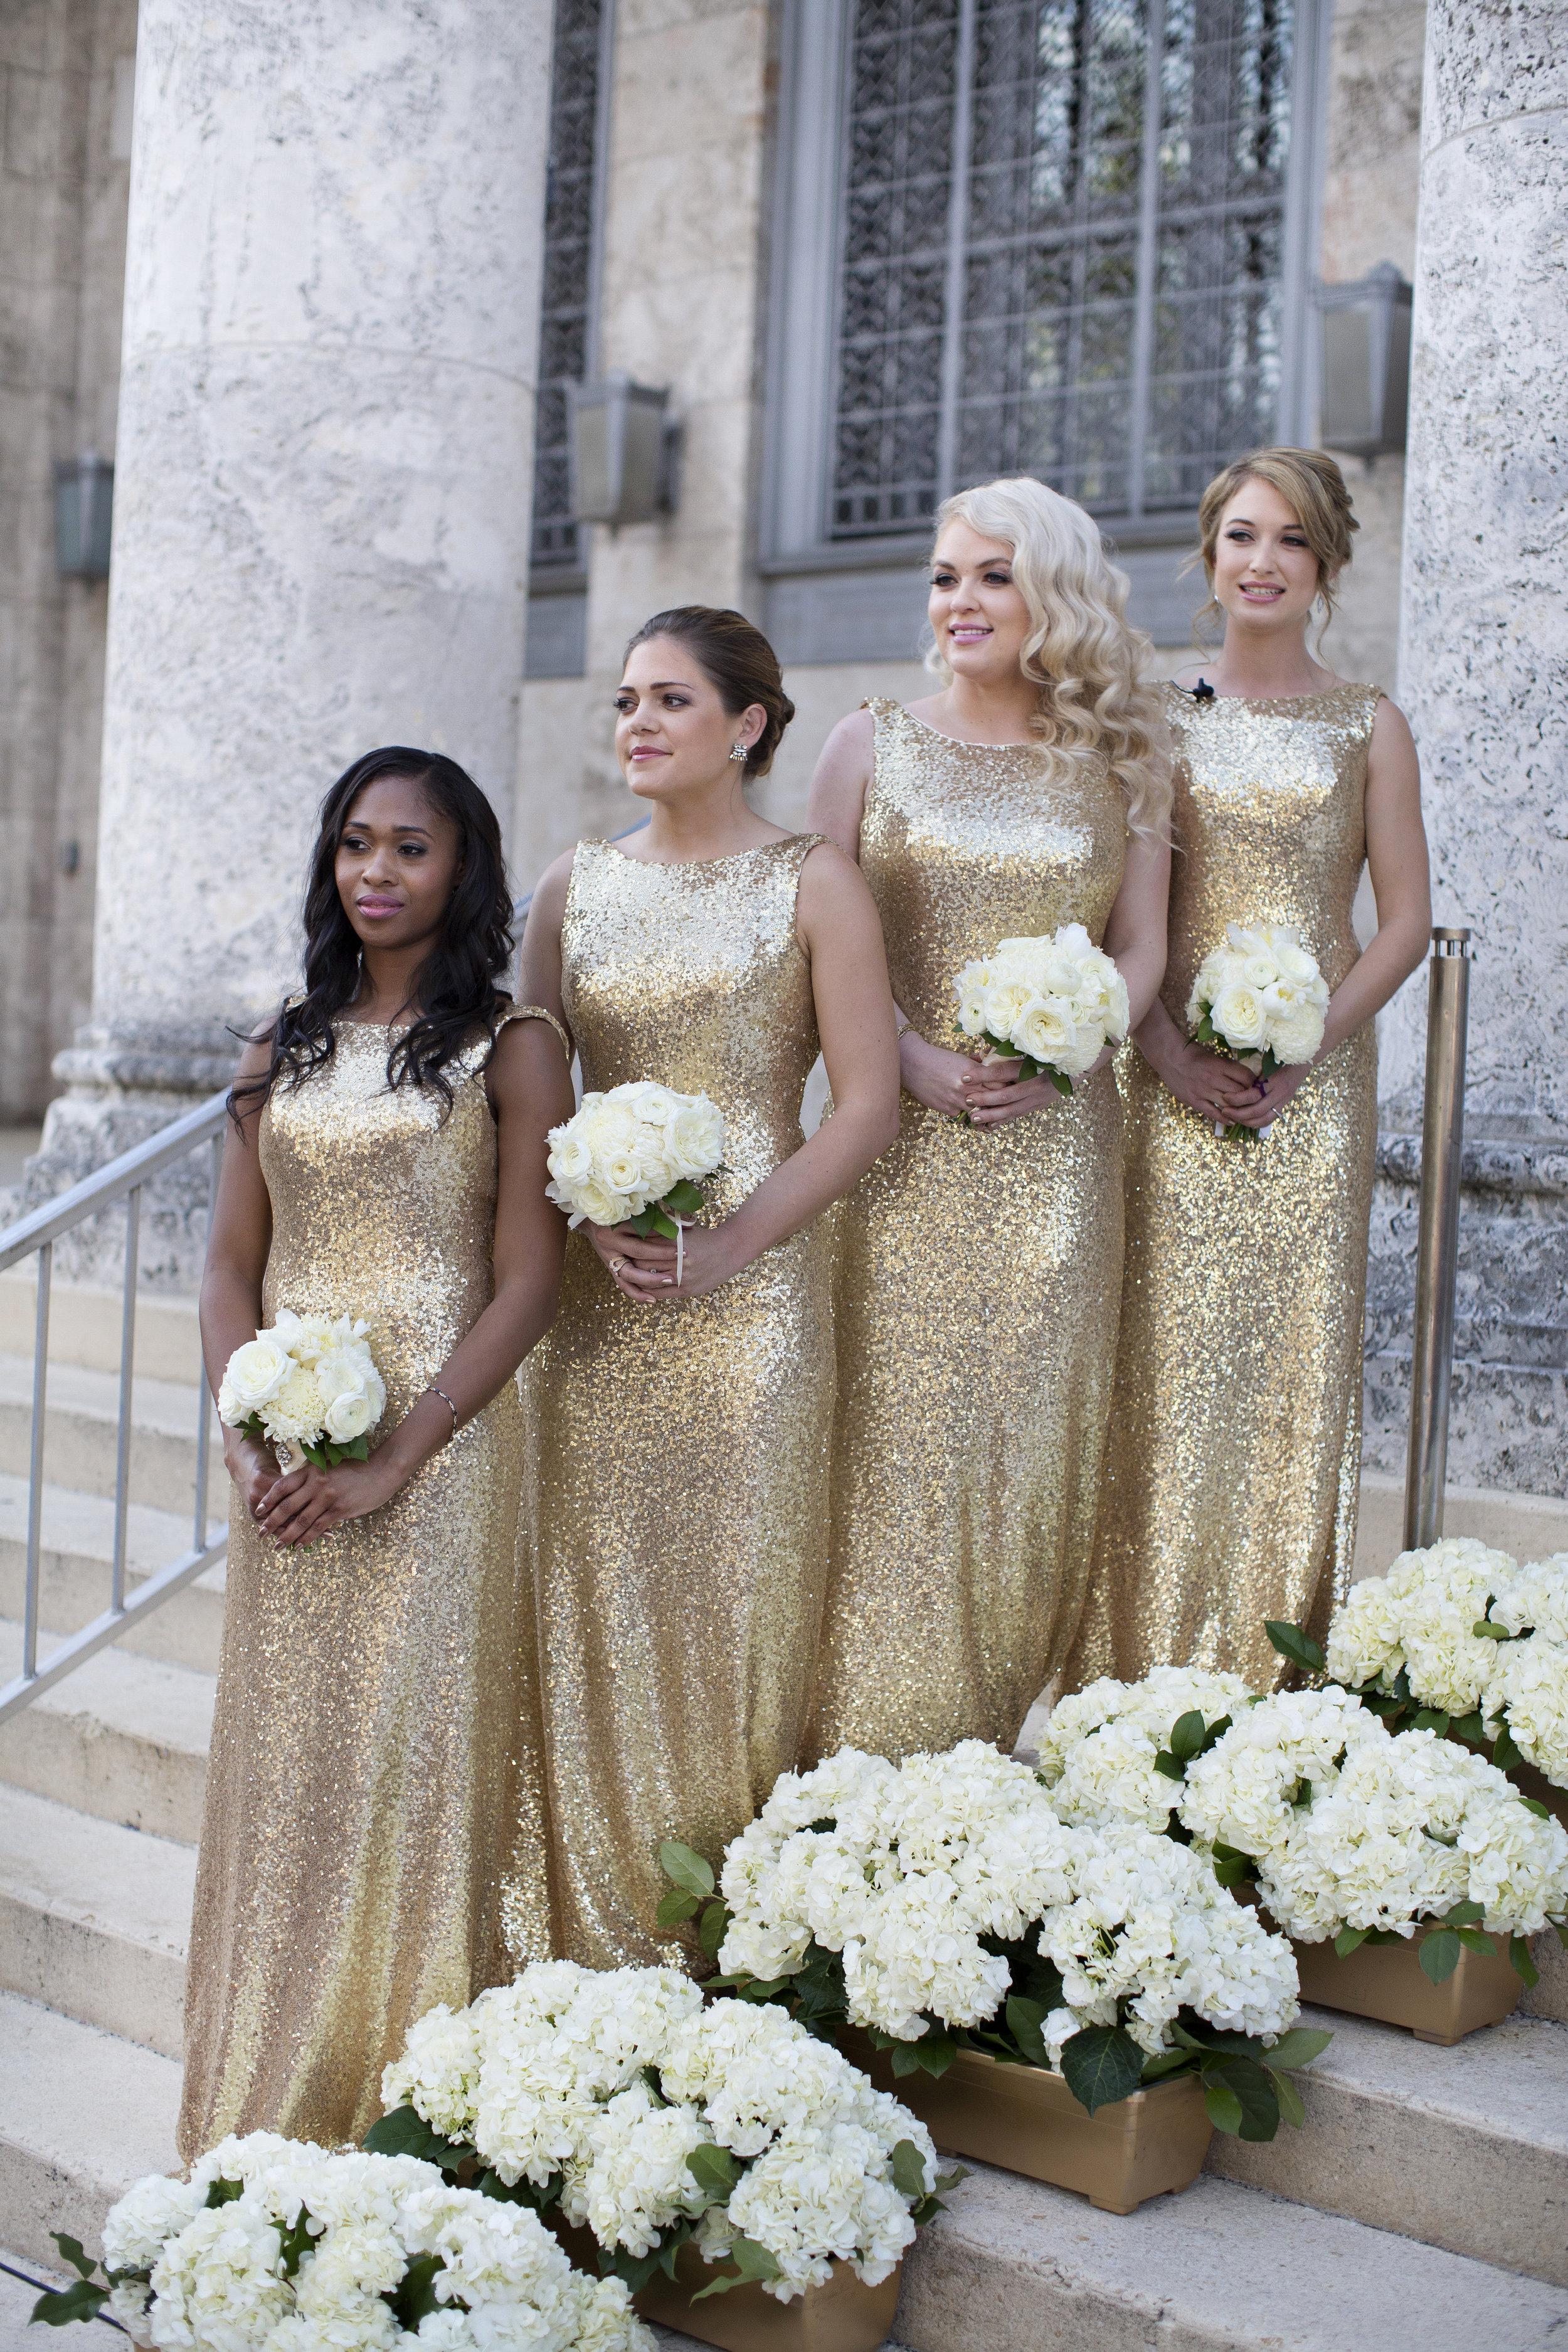 Jet Set Wed :: Daughter of Bridal Fashion Guru House of Wu Stuns in A Classic Regal Asian Wedding